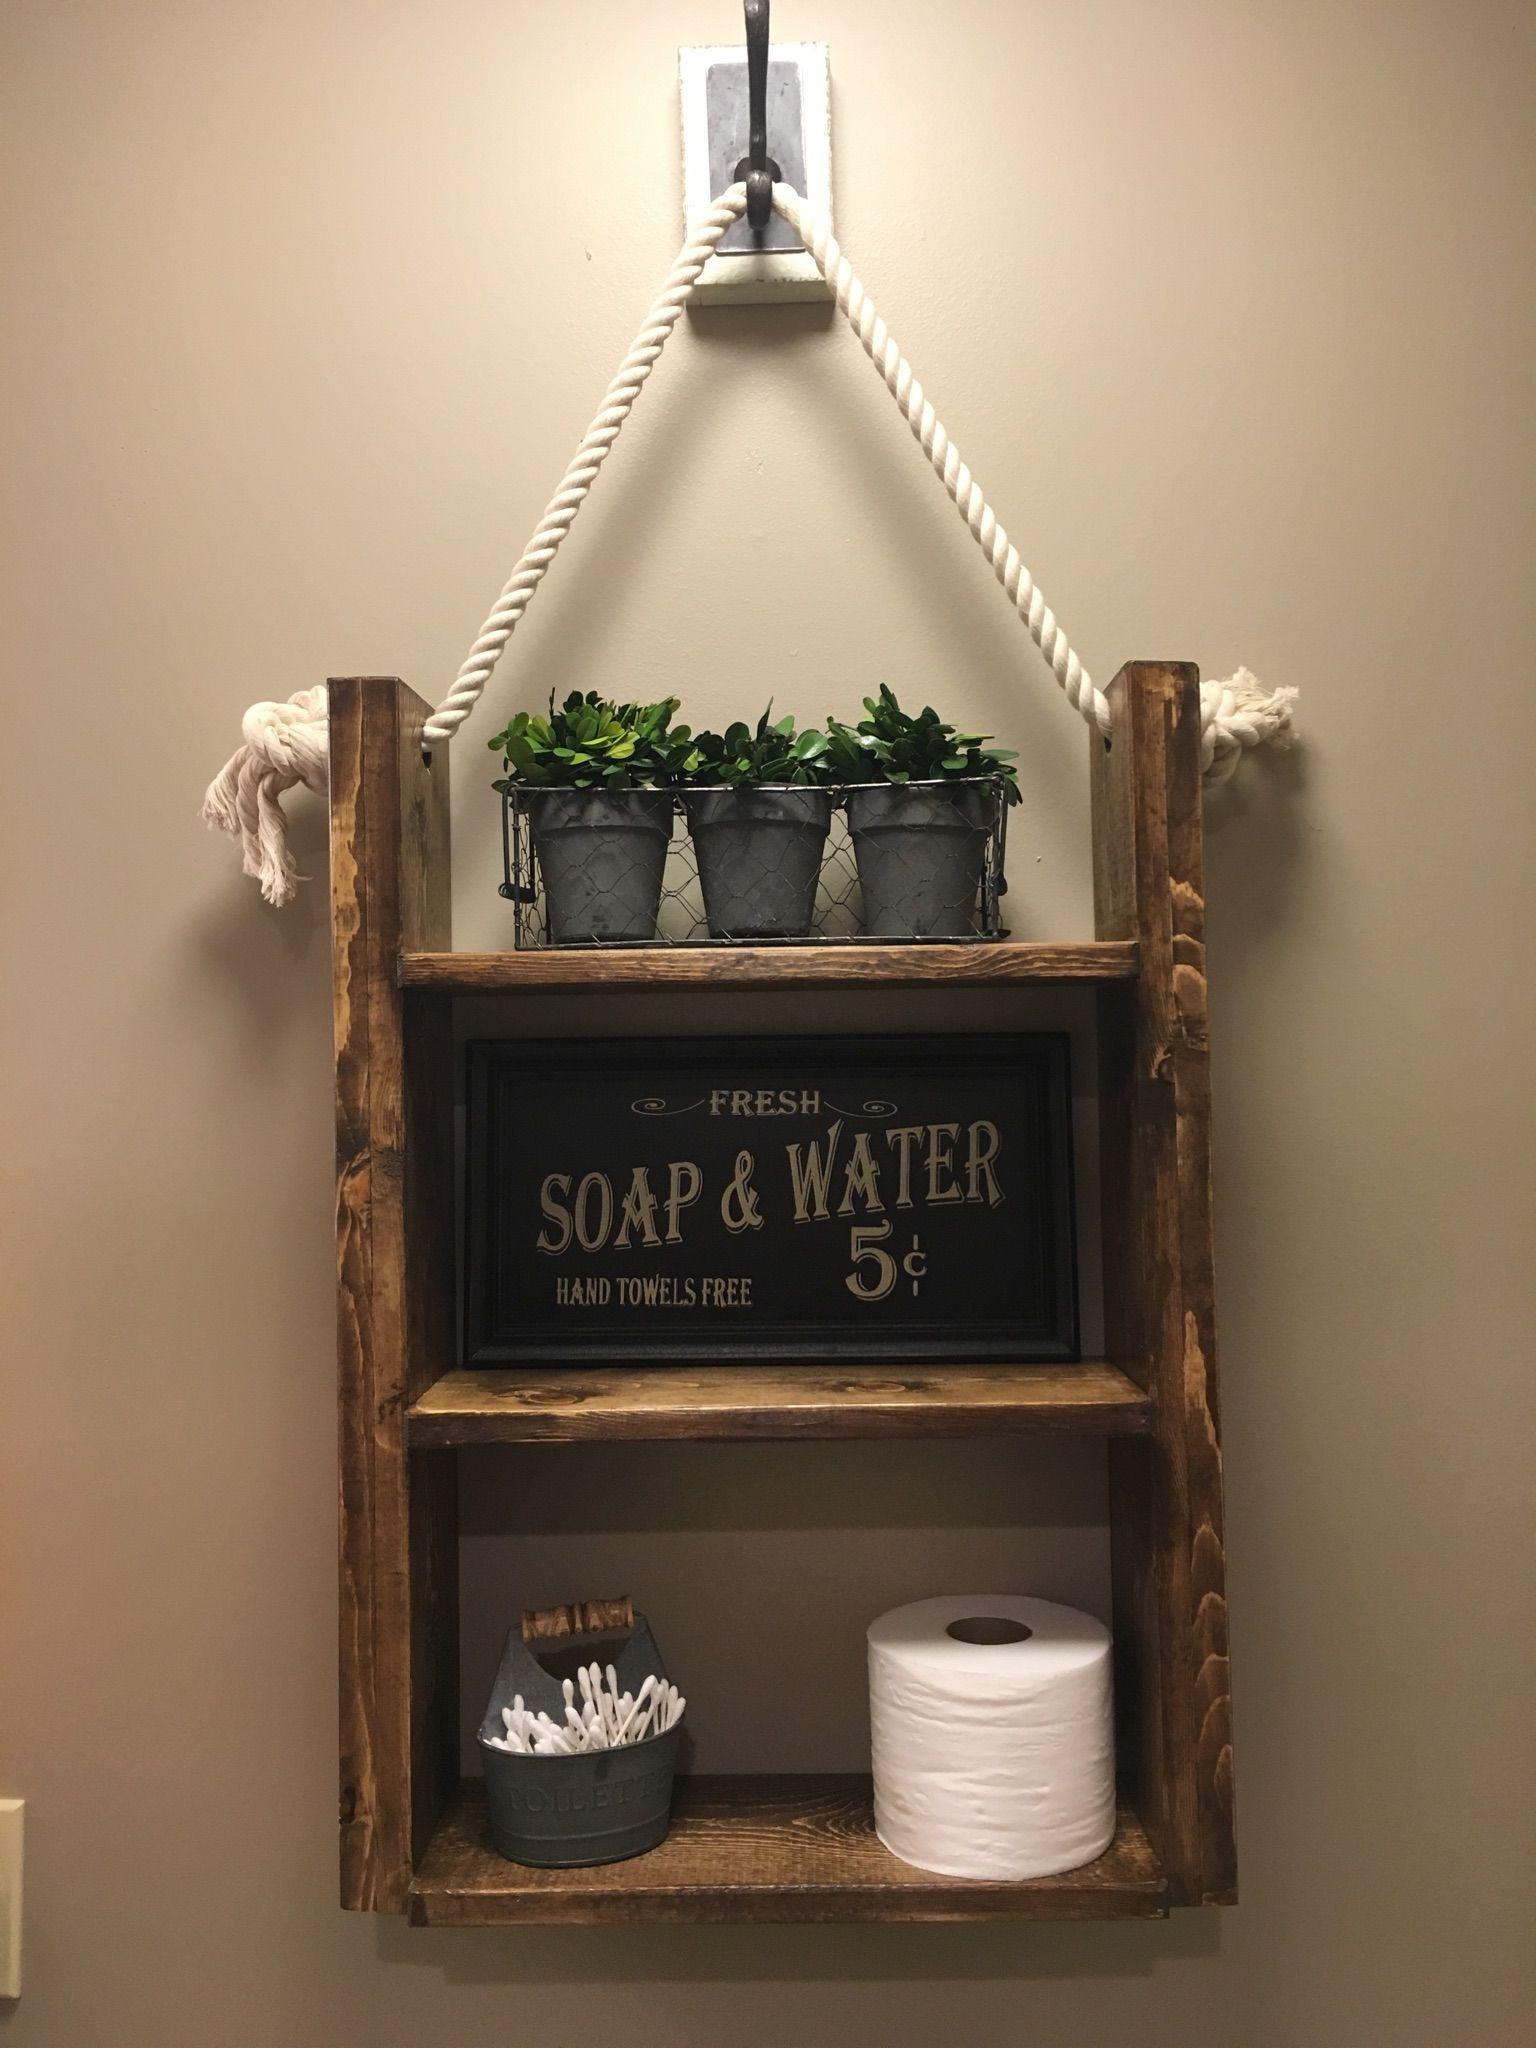 Farmhouse Rustic Bathroom Shelf Hanging Shelf Rope Shelf